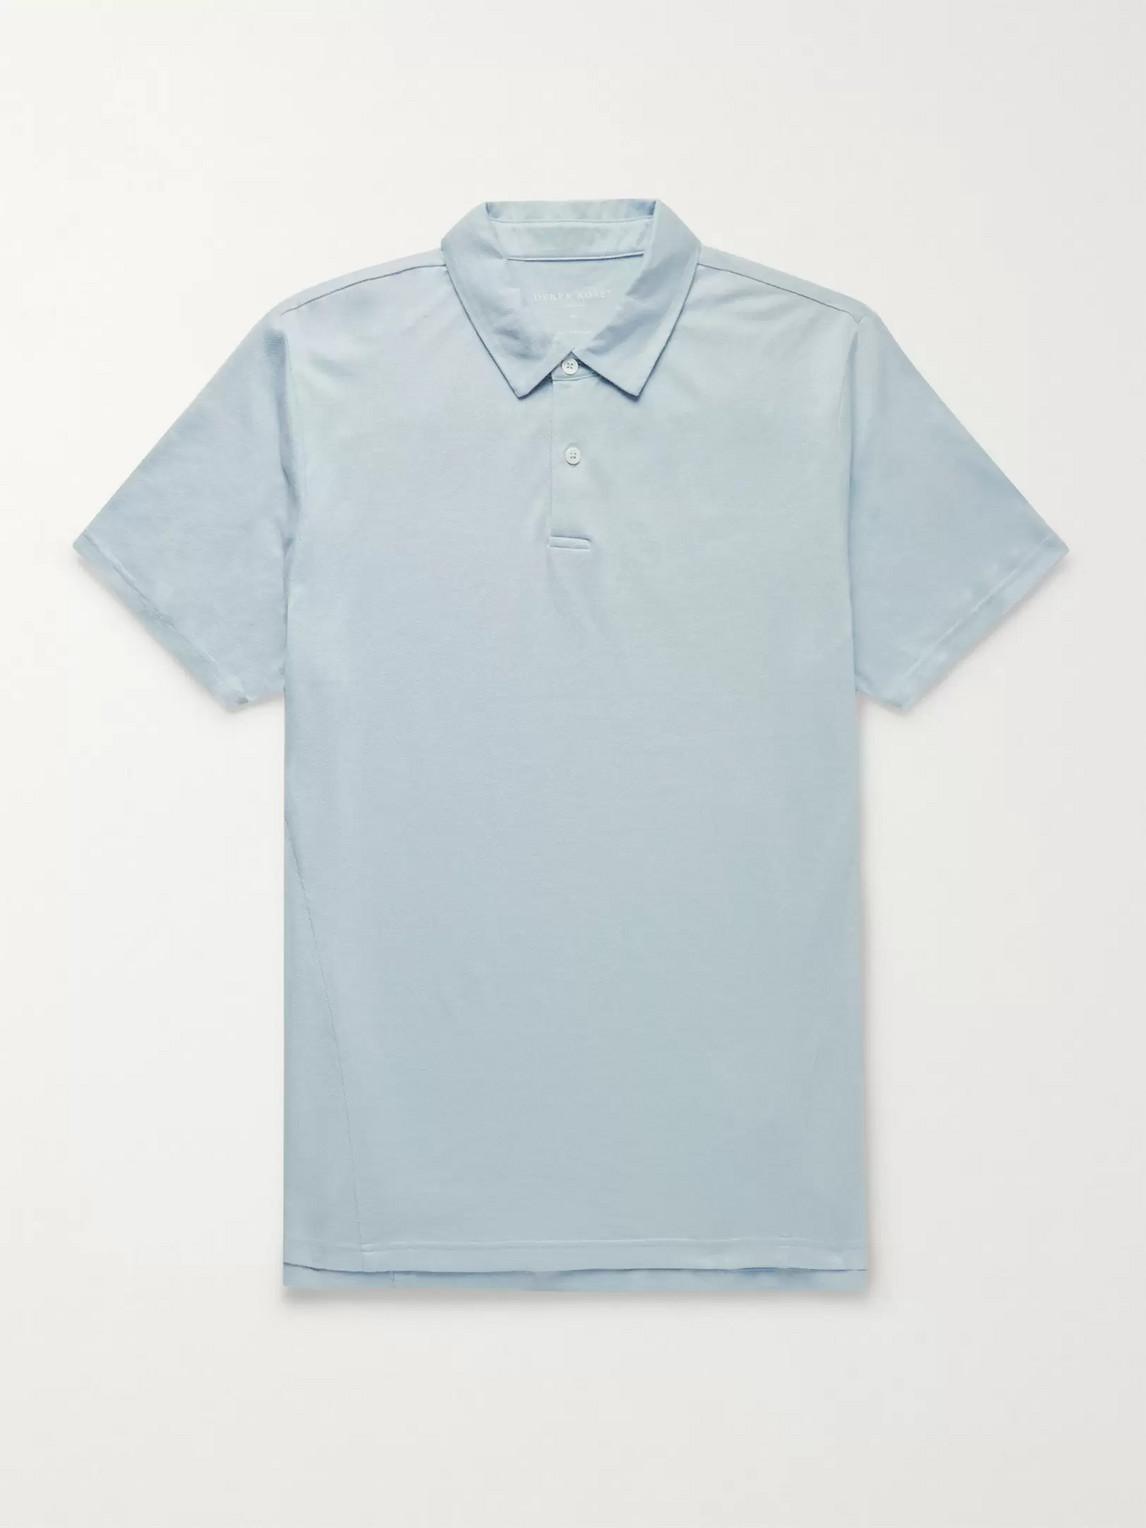 derek rose - ramsay stretch cotton and tencel-blend piquã© polo shirt - blue - xxl - men